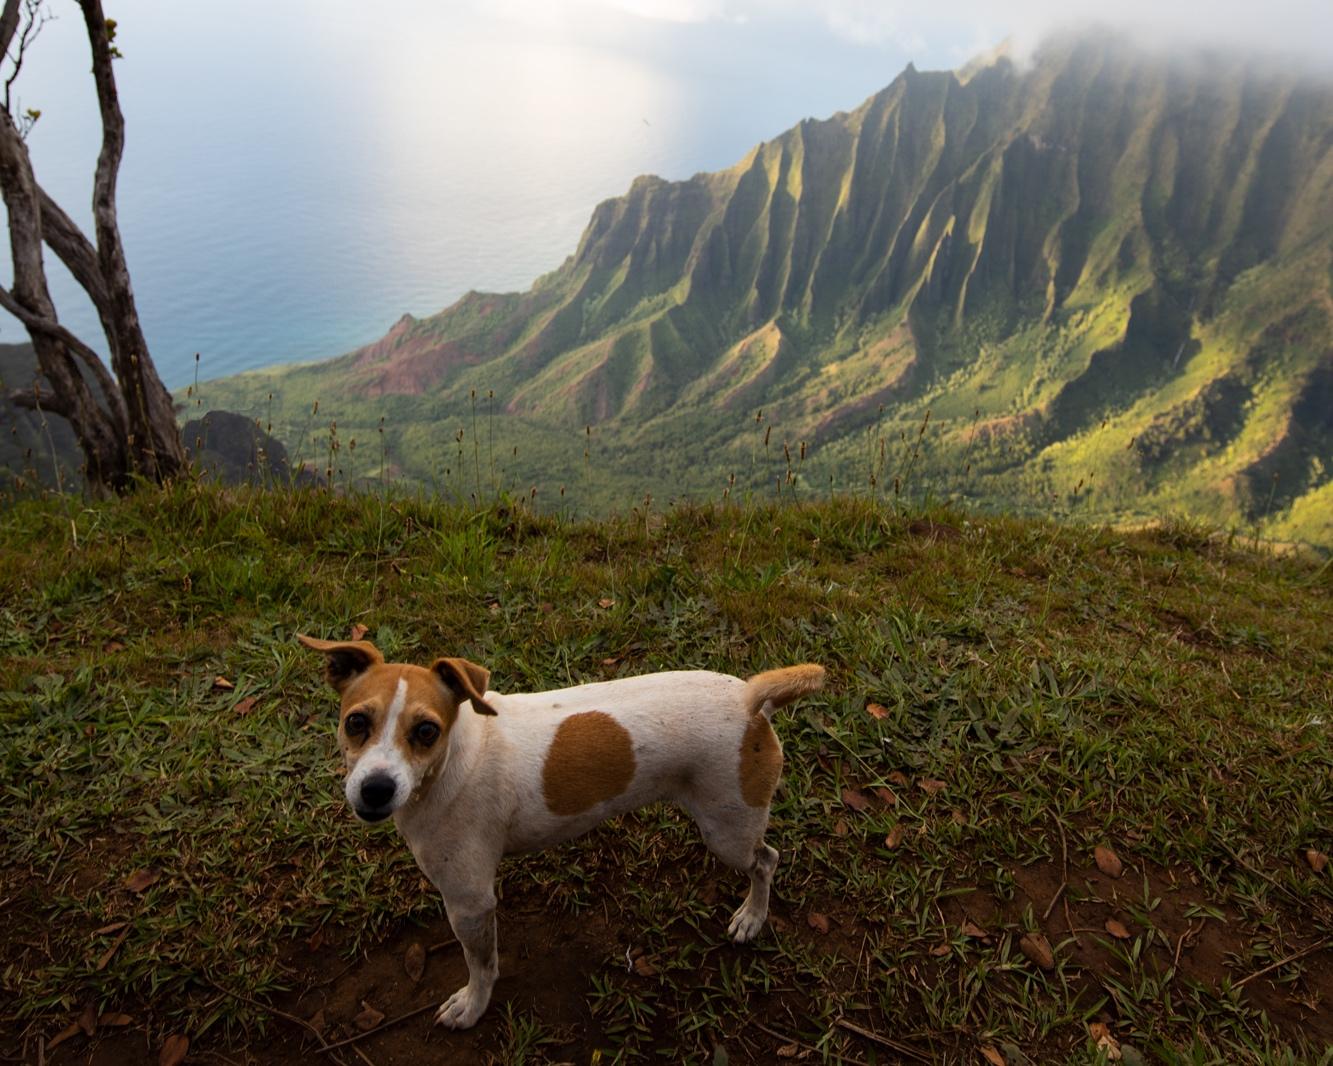 Hula the Hunting Dog